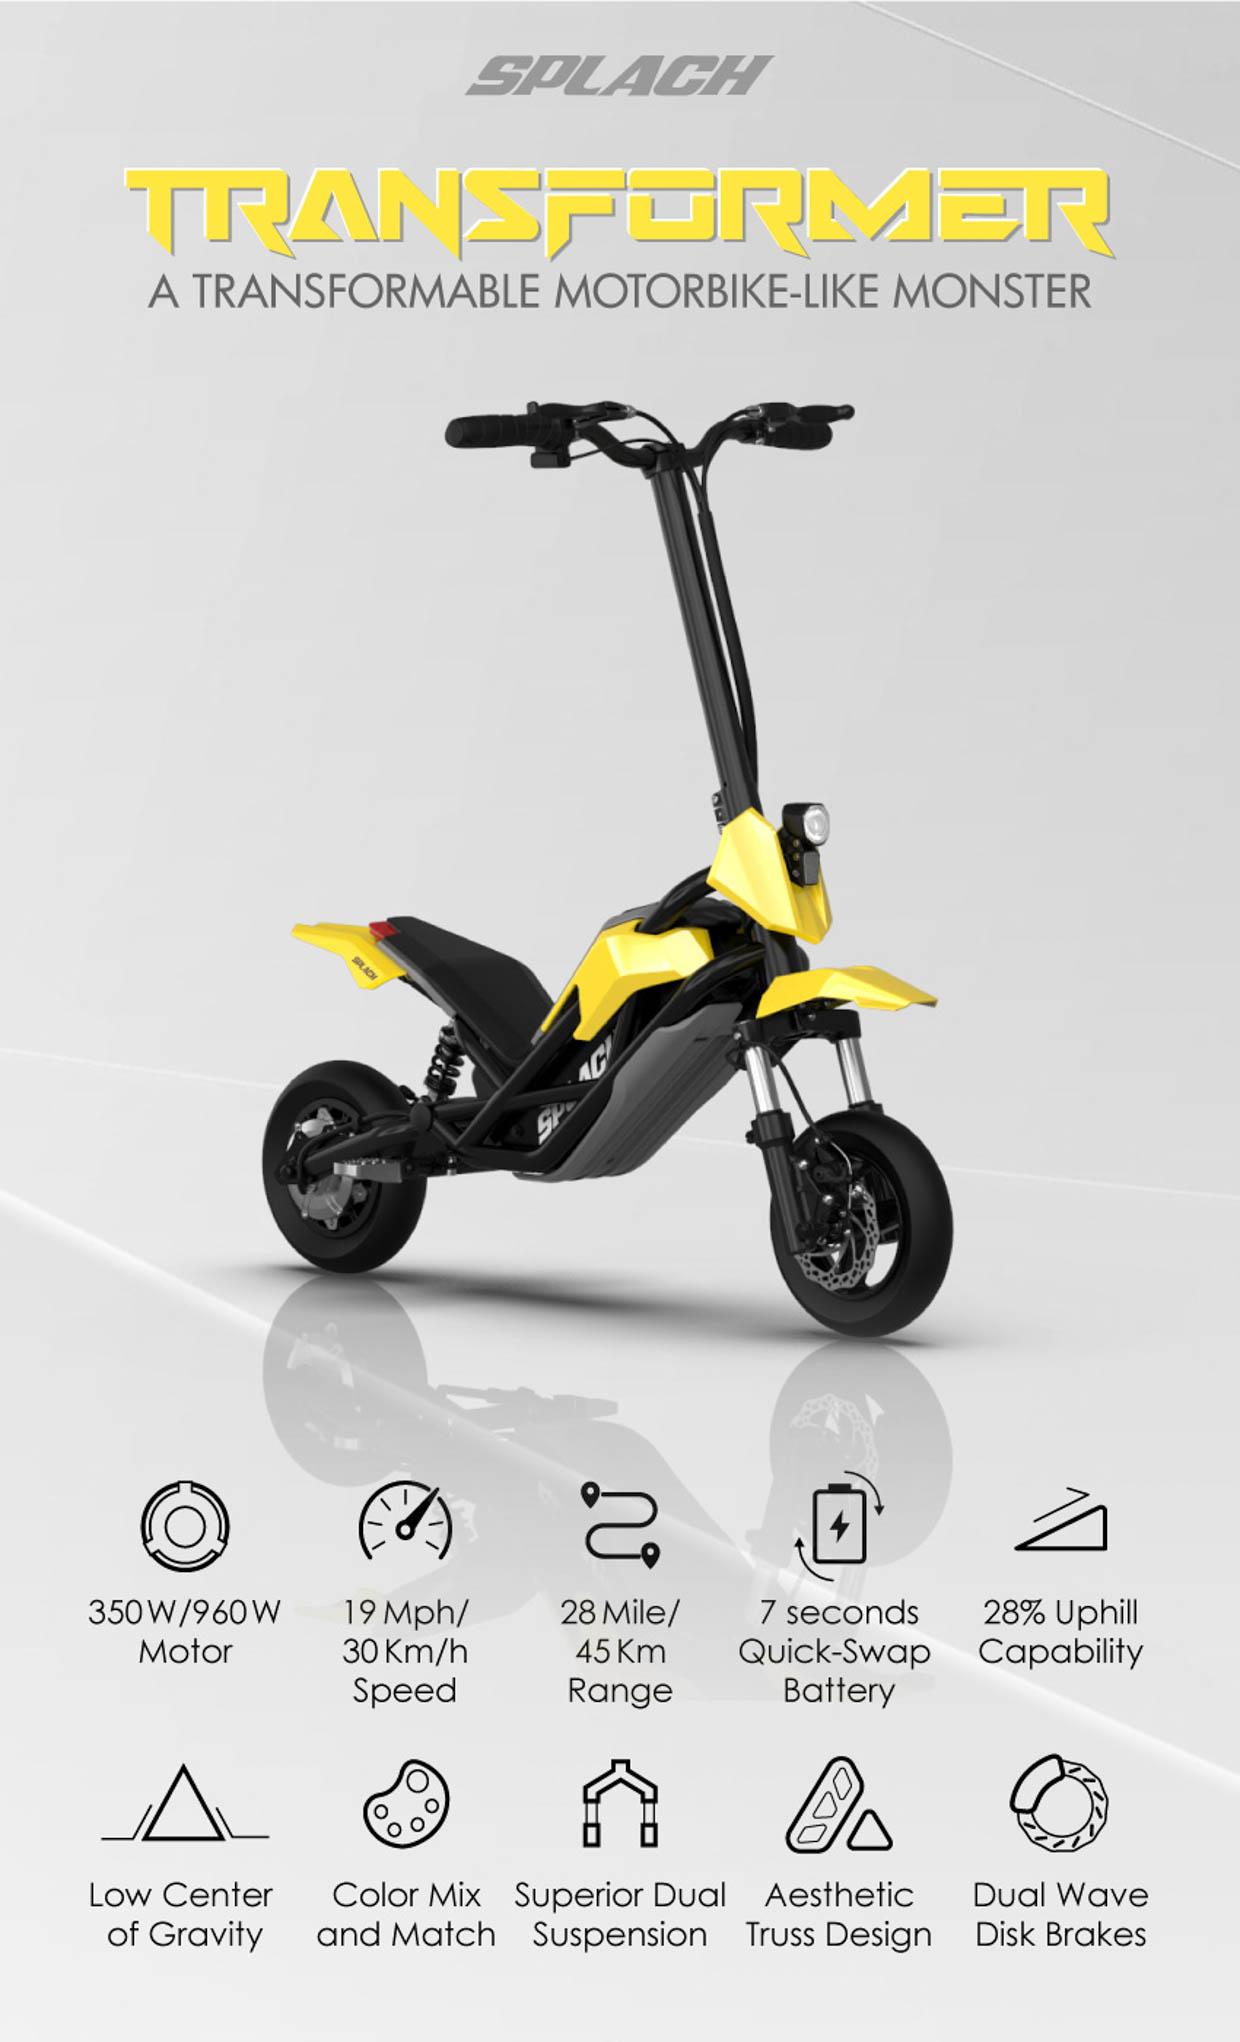 Splatch Transformer Scooter